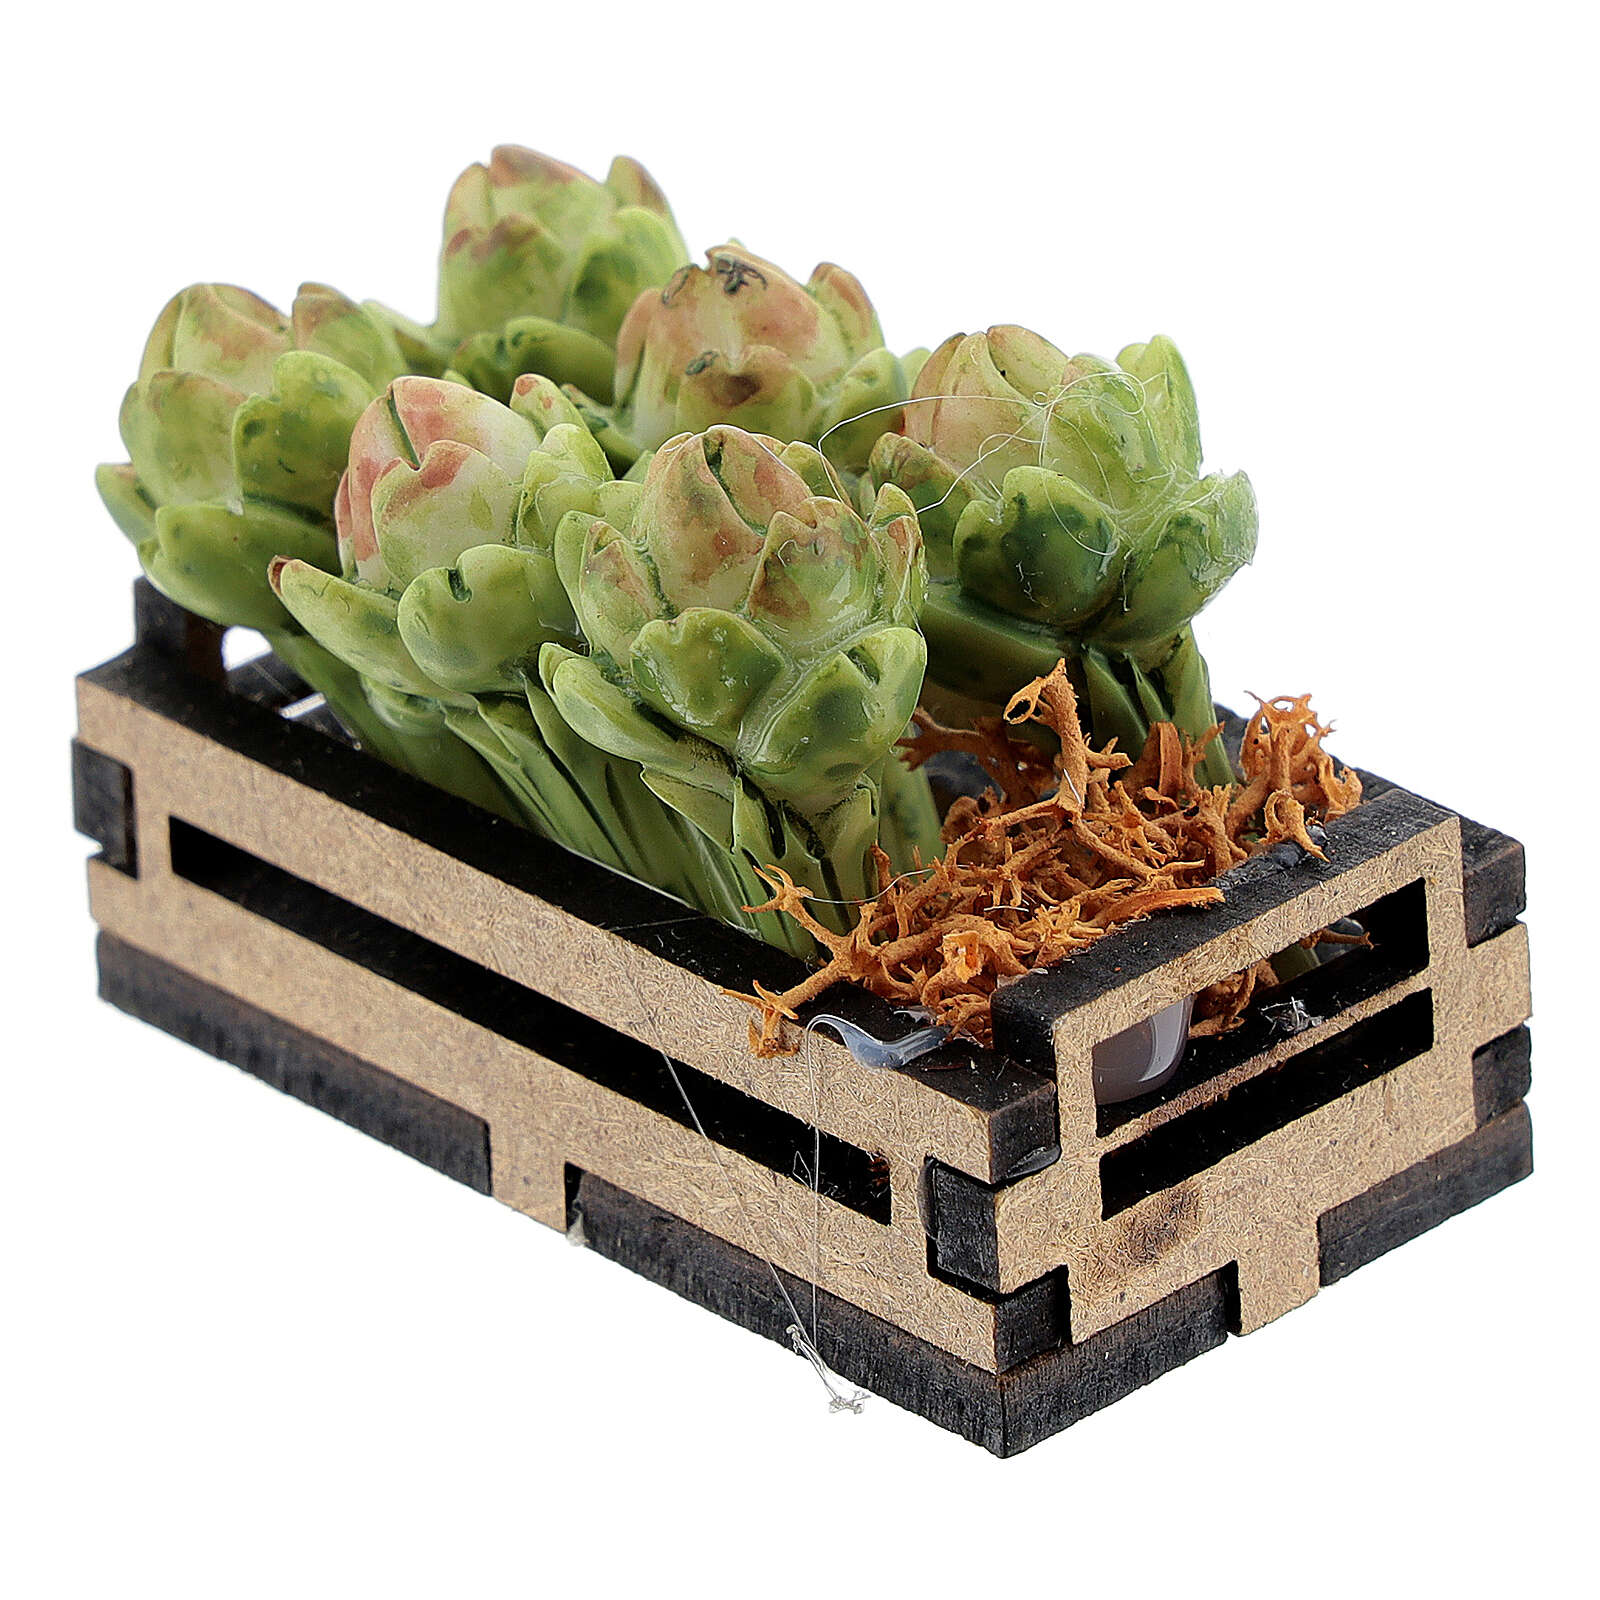 Box with artichokes for Nativity Scene with 12-14 cm figurines 4